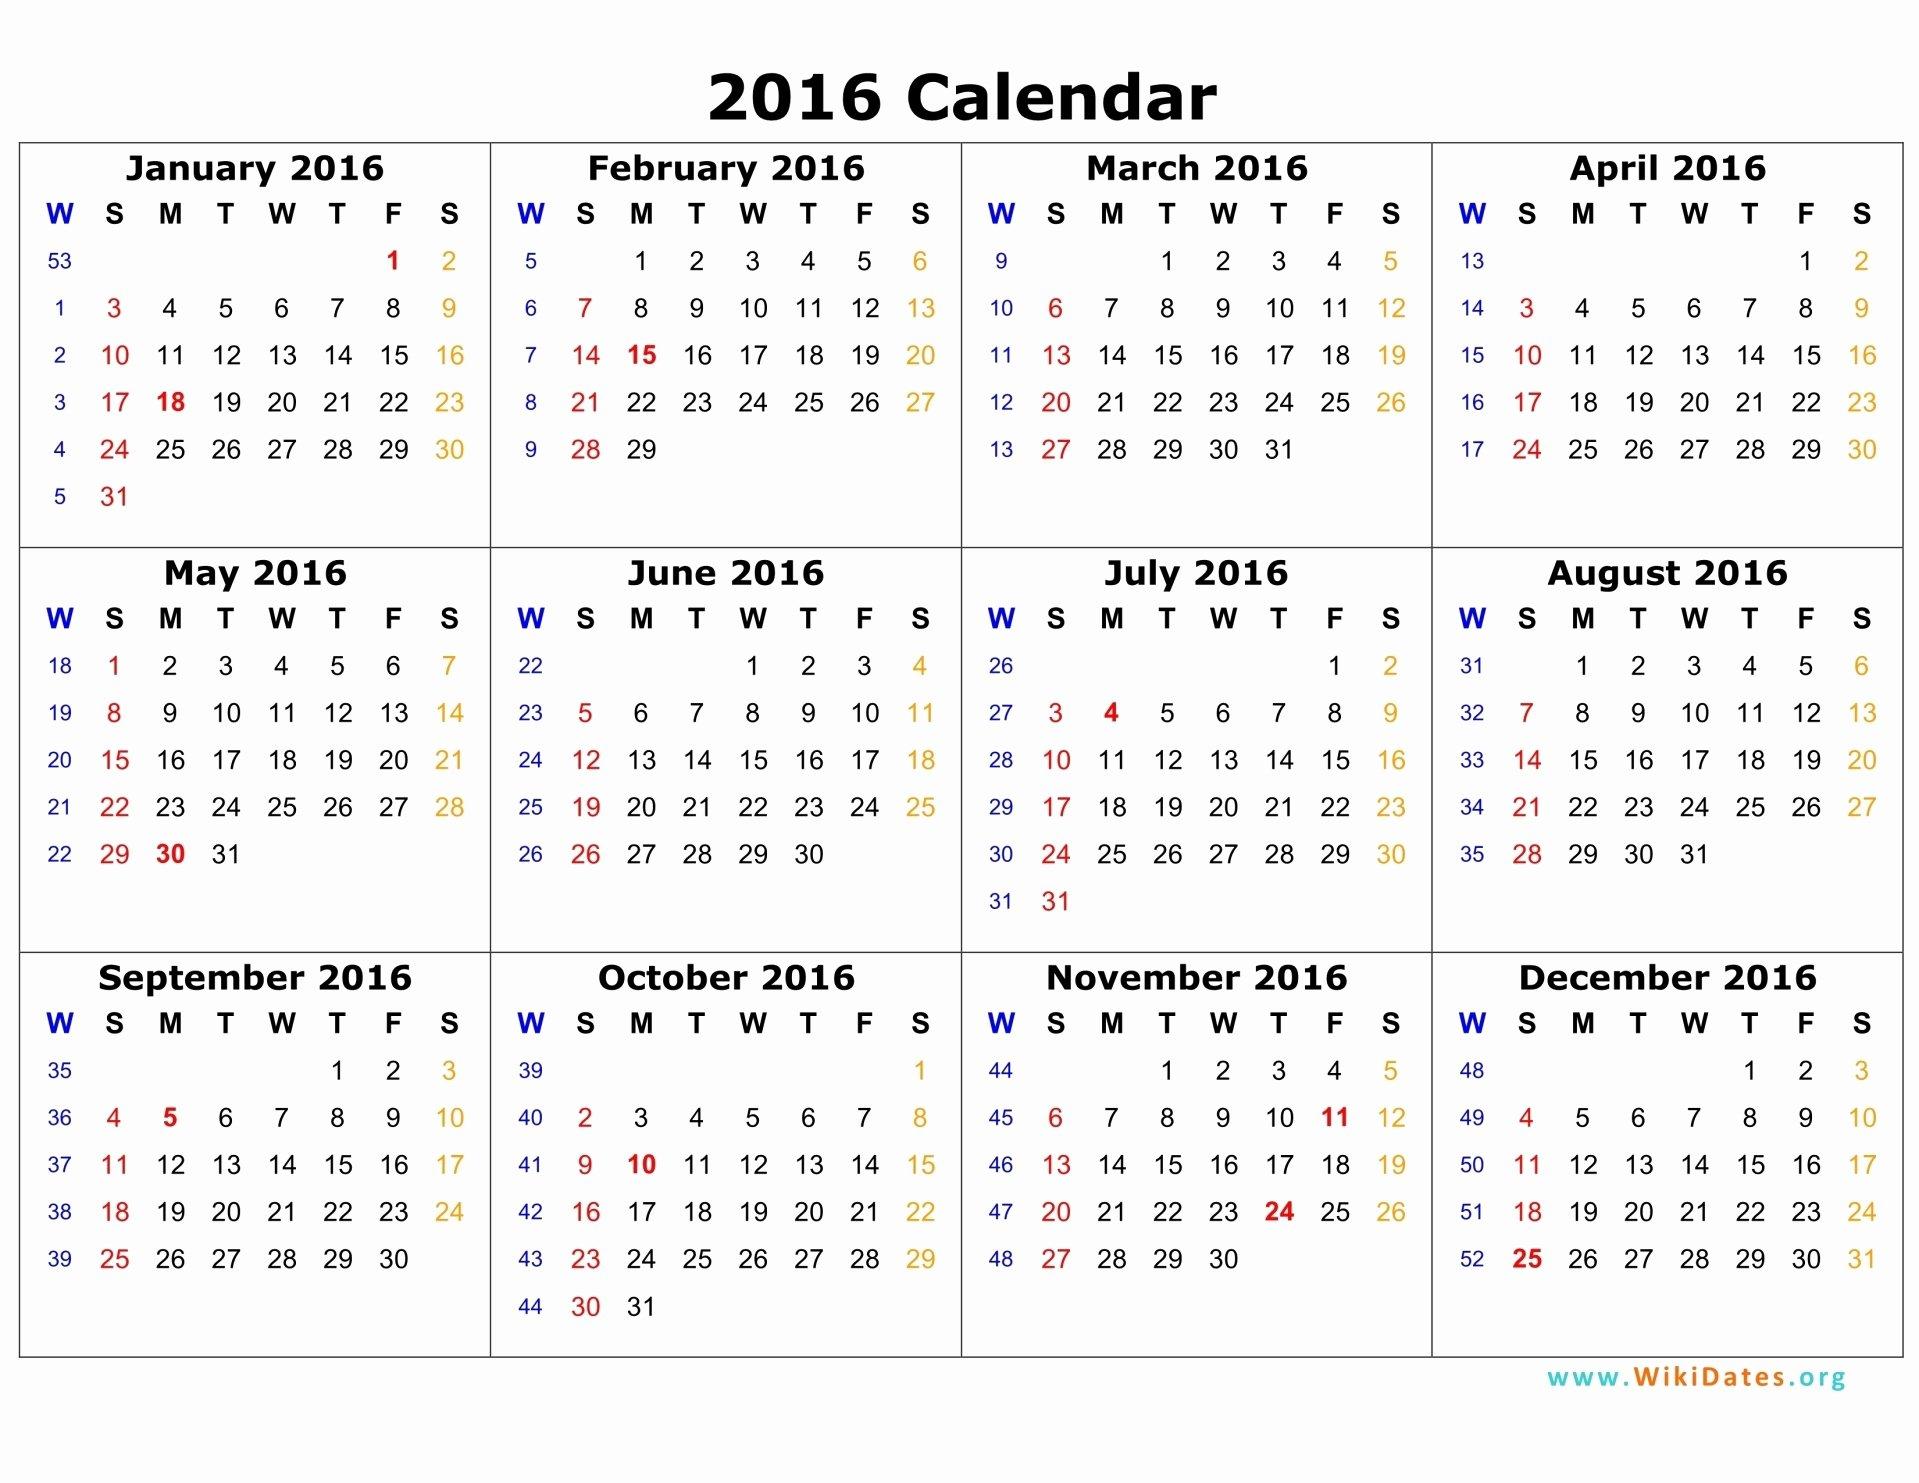 Vacation Schedule Template 2016 Luxury 2016 Calendar